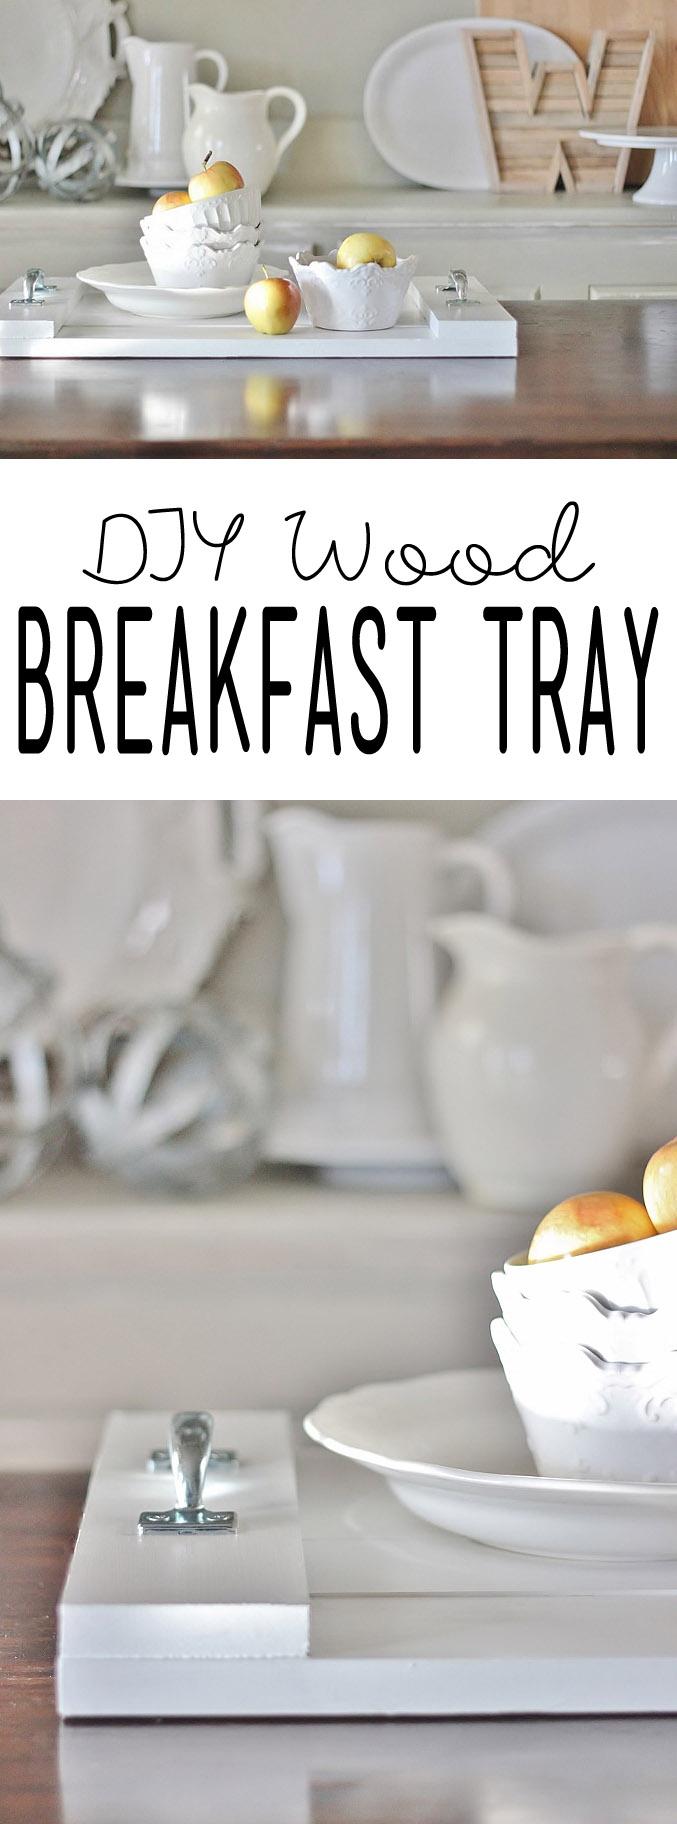 CCRebeccaDIY-Breakfast-Tray-tower